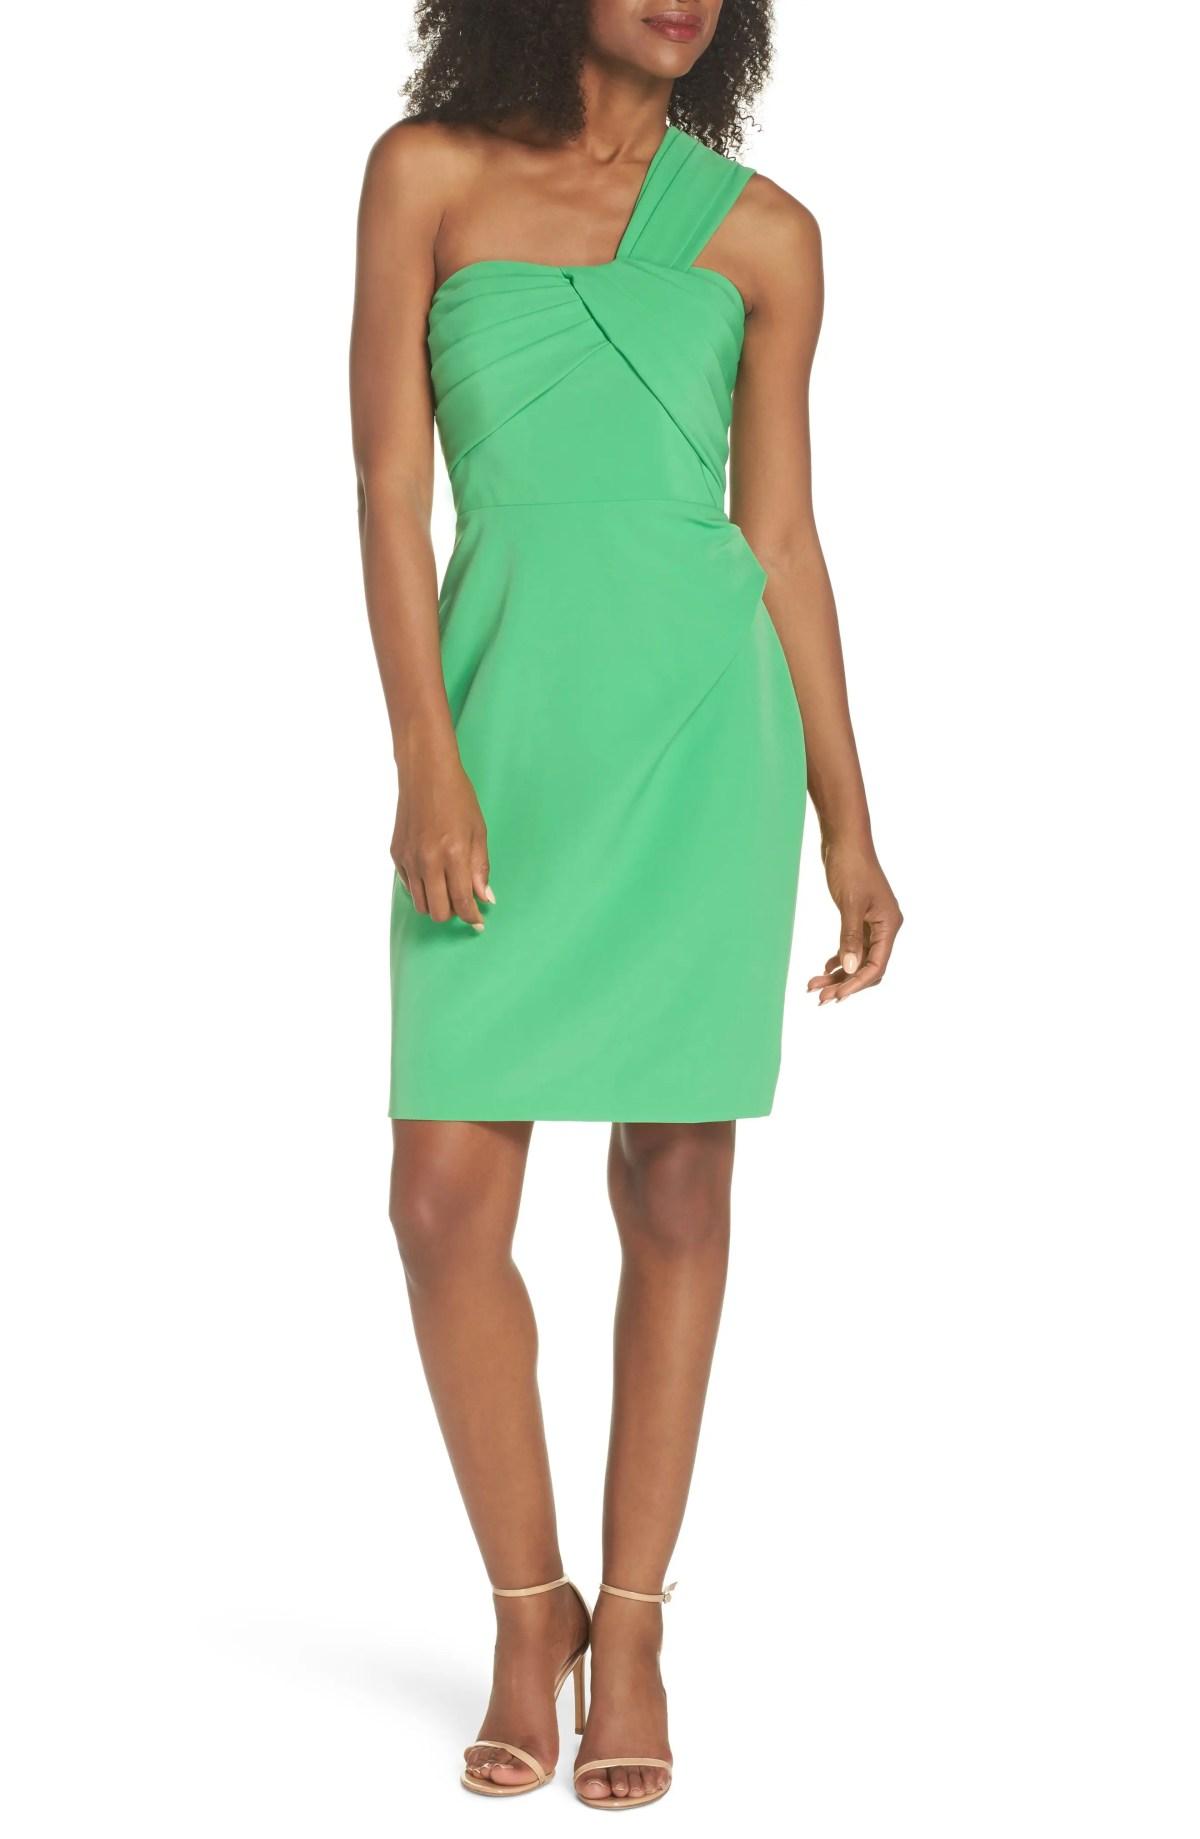 VINCE CAMUTO Laguna One-Shoulder Scuba Dress, Main, color, GREEN